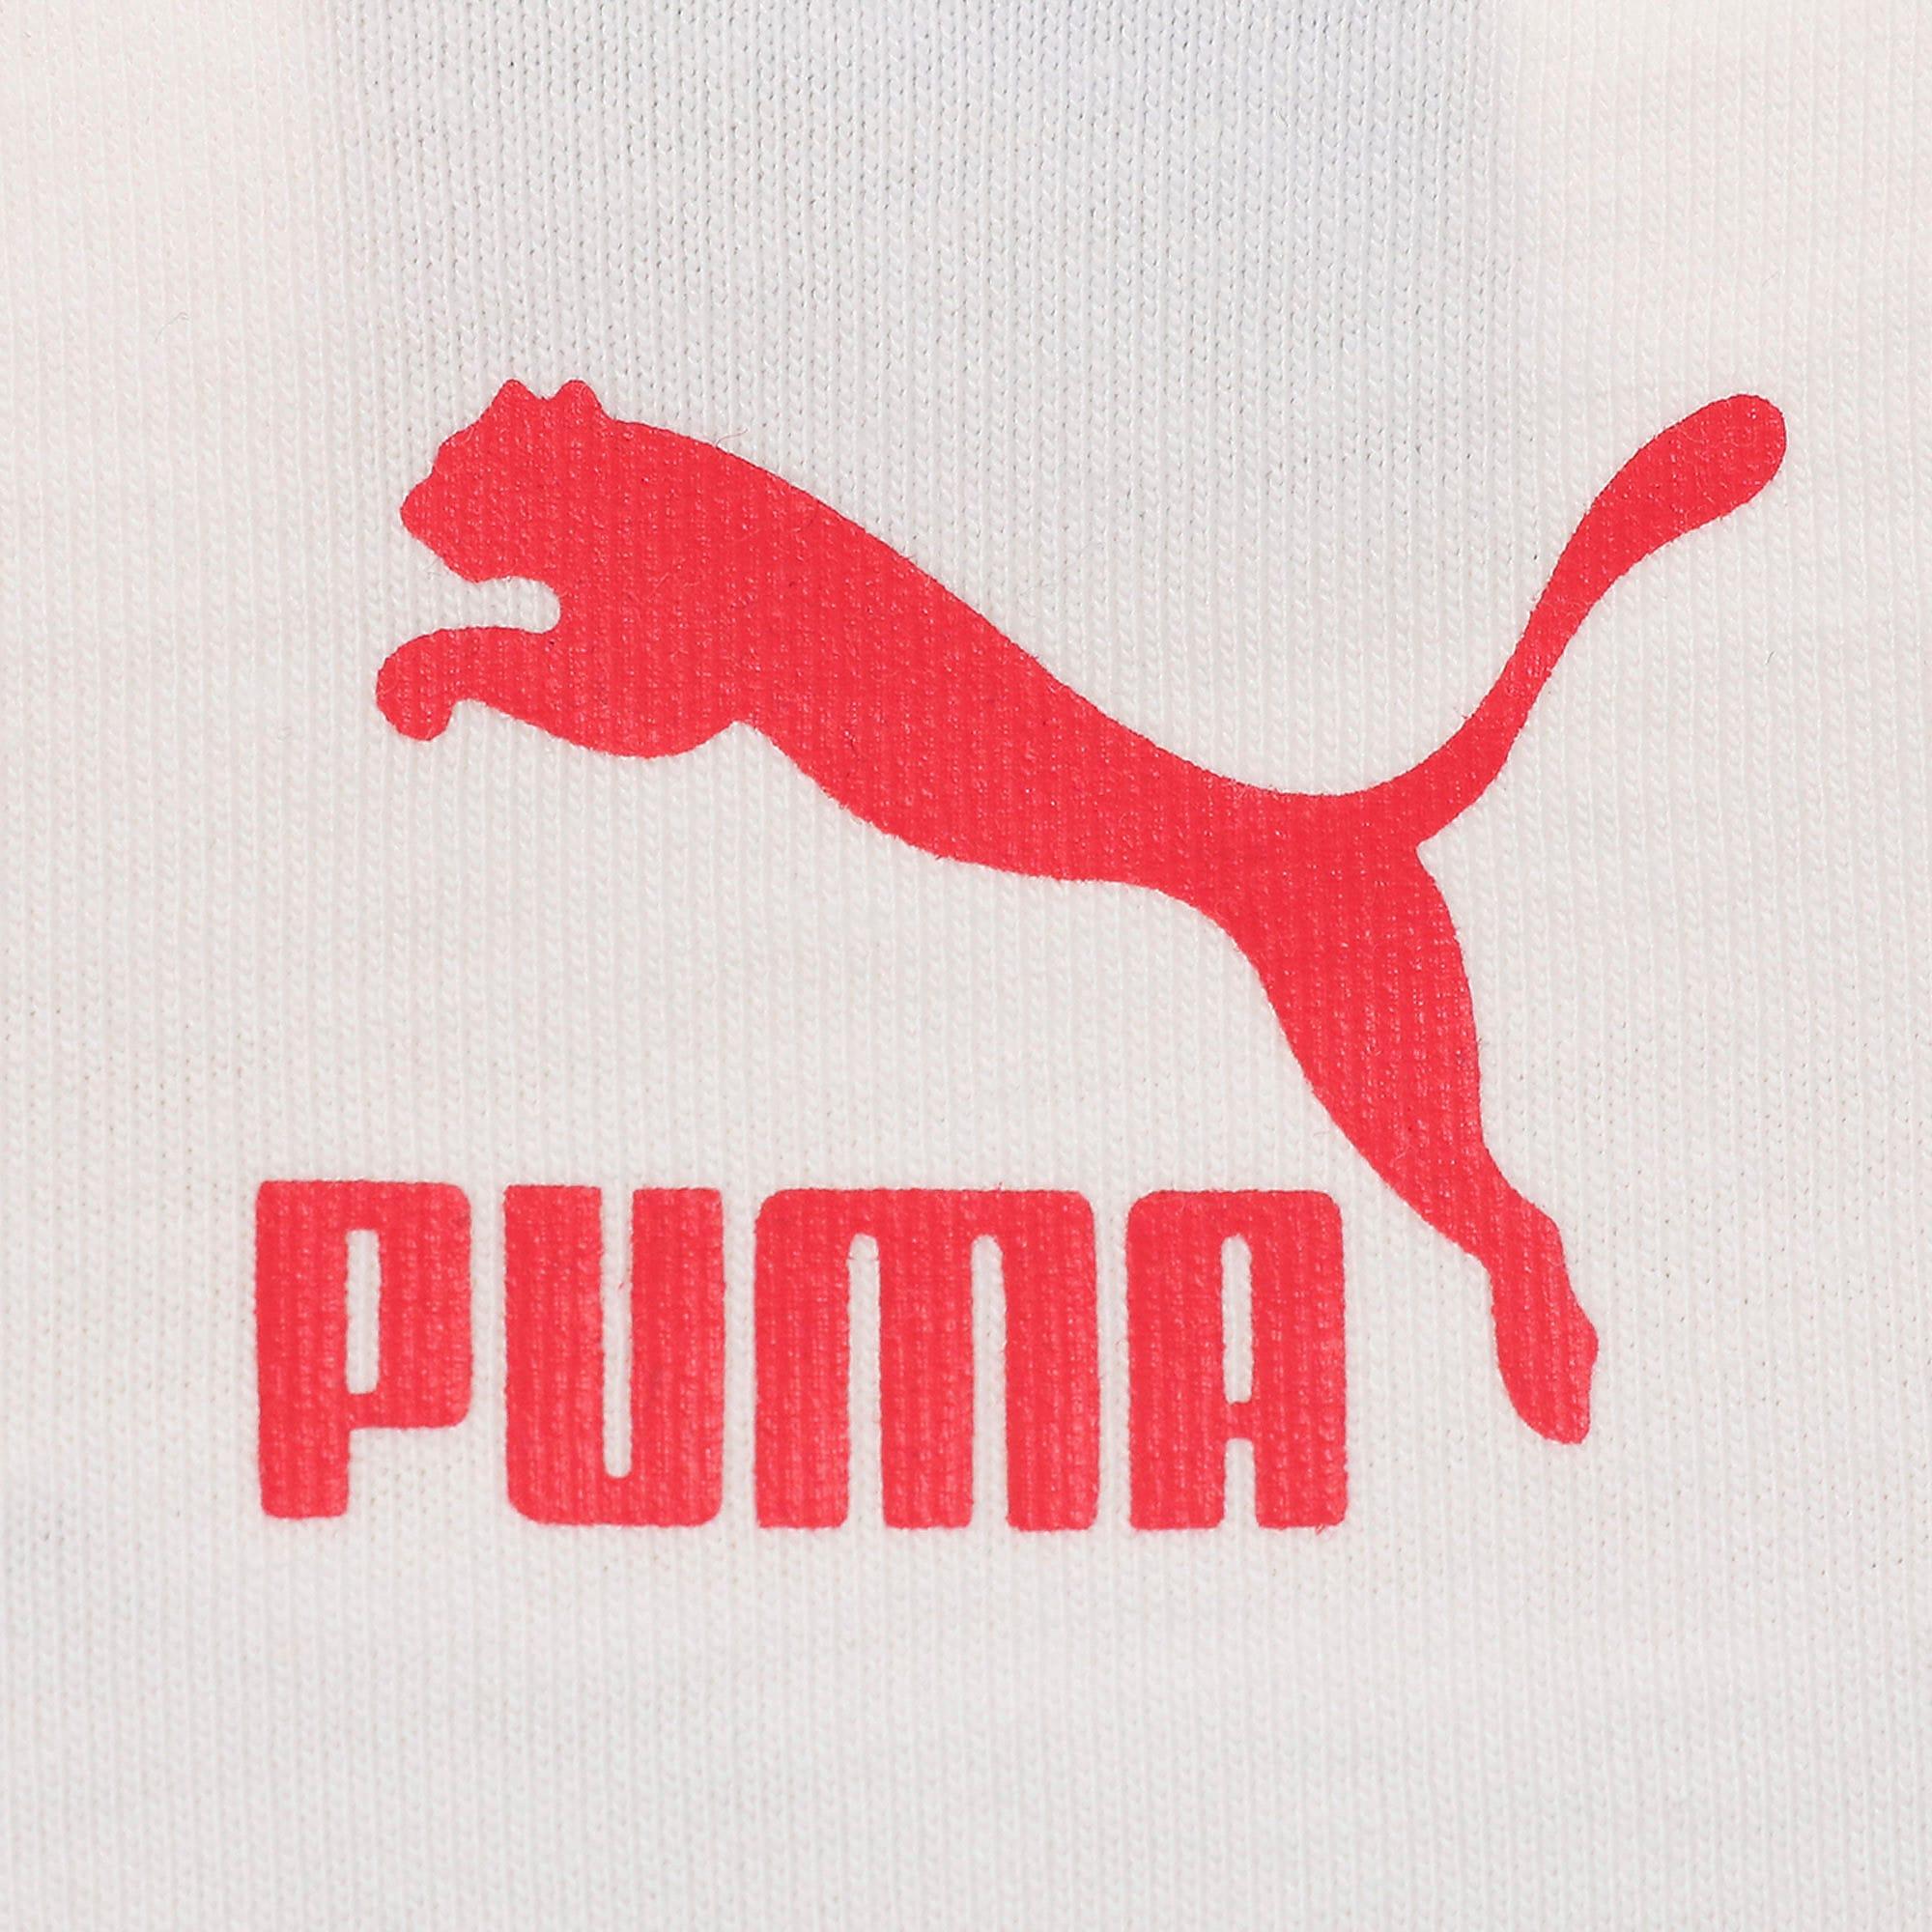 Thumbnail 6 of PUMA XTG グラフィック ウィメンズ SS Tシャツ 半袖, Puma White, medium-JPN